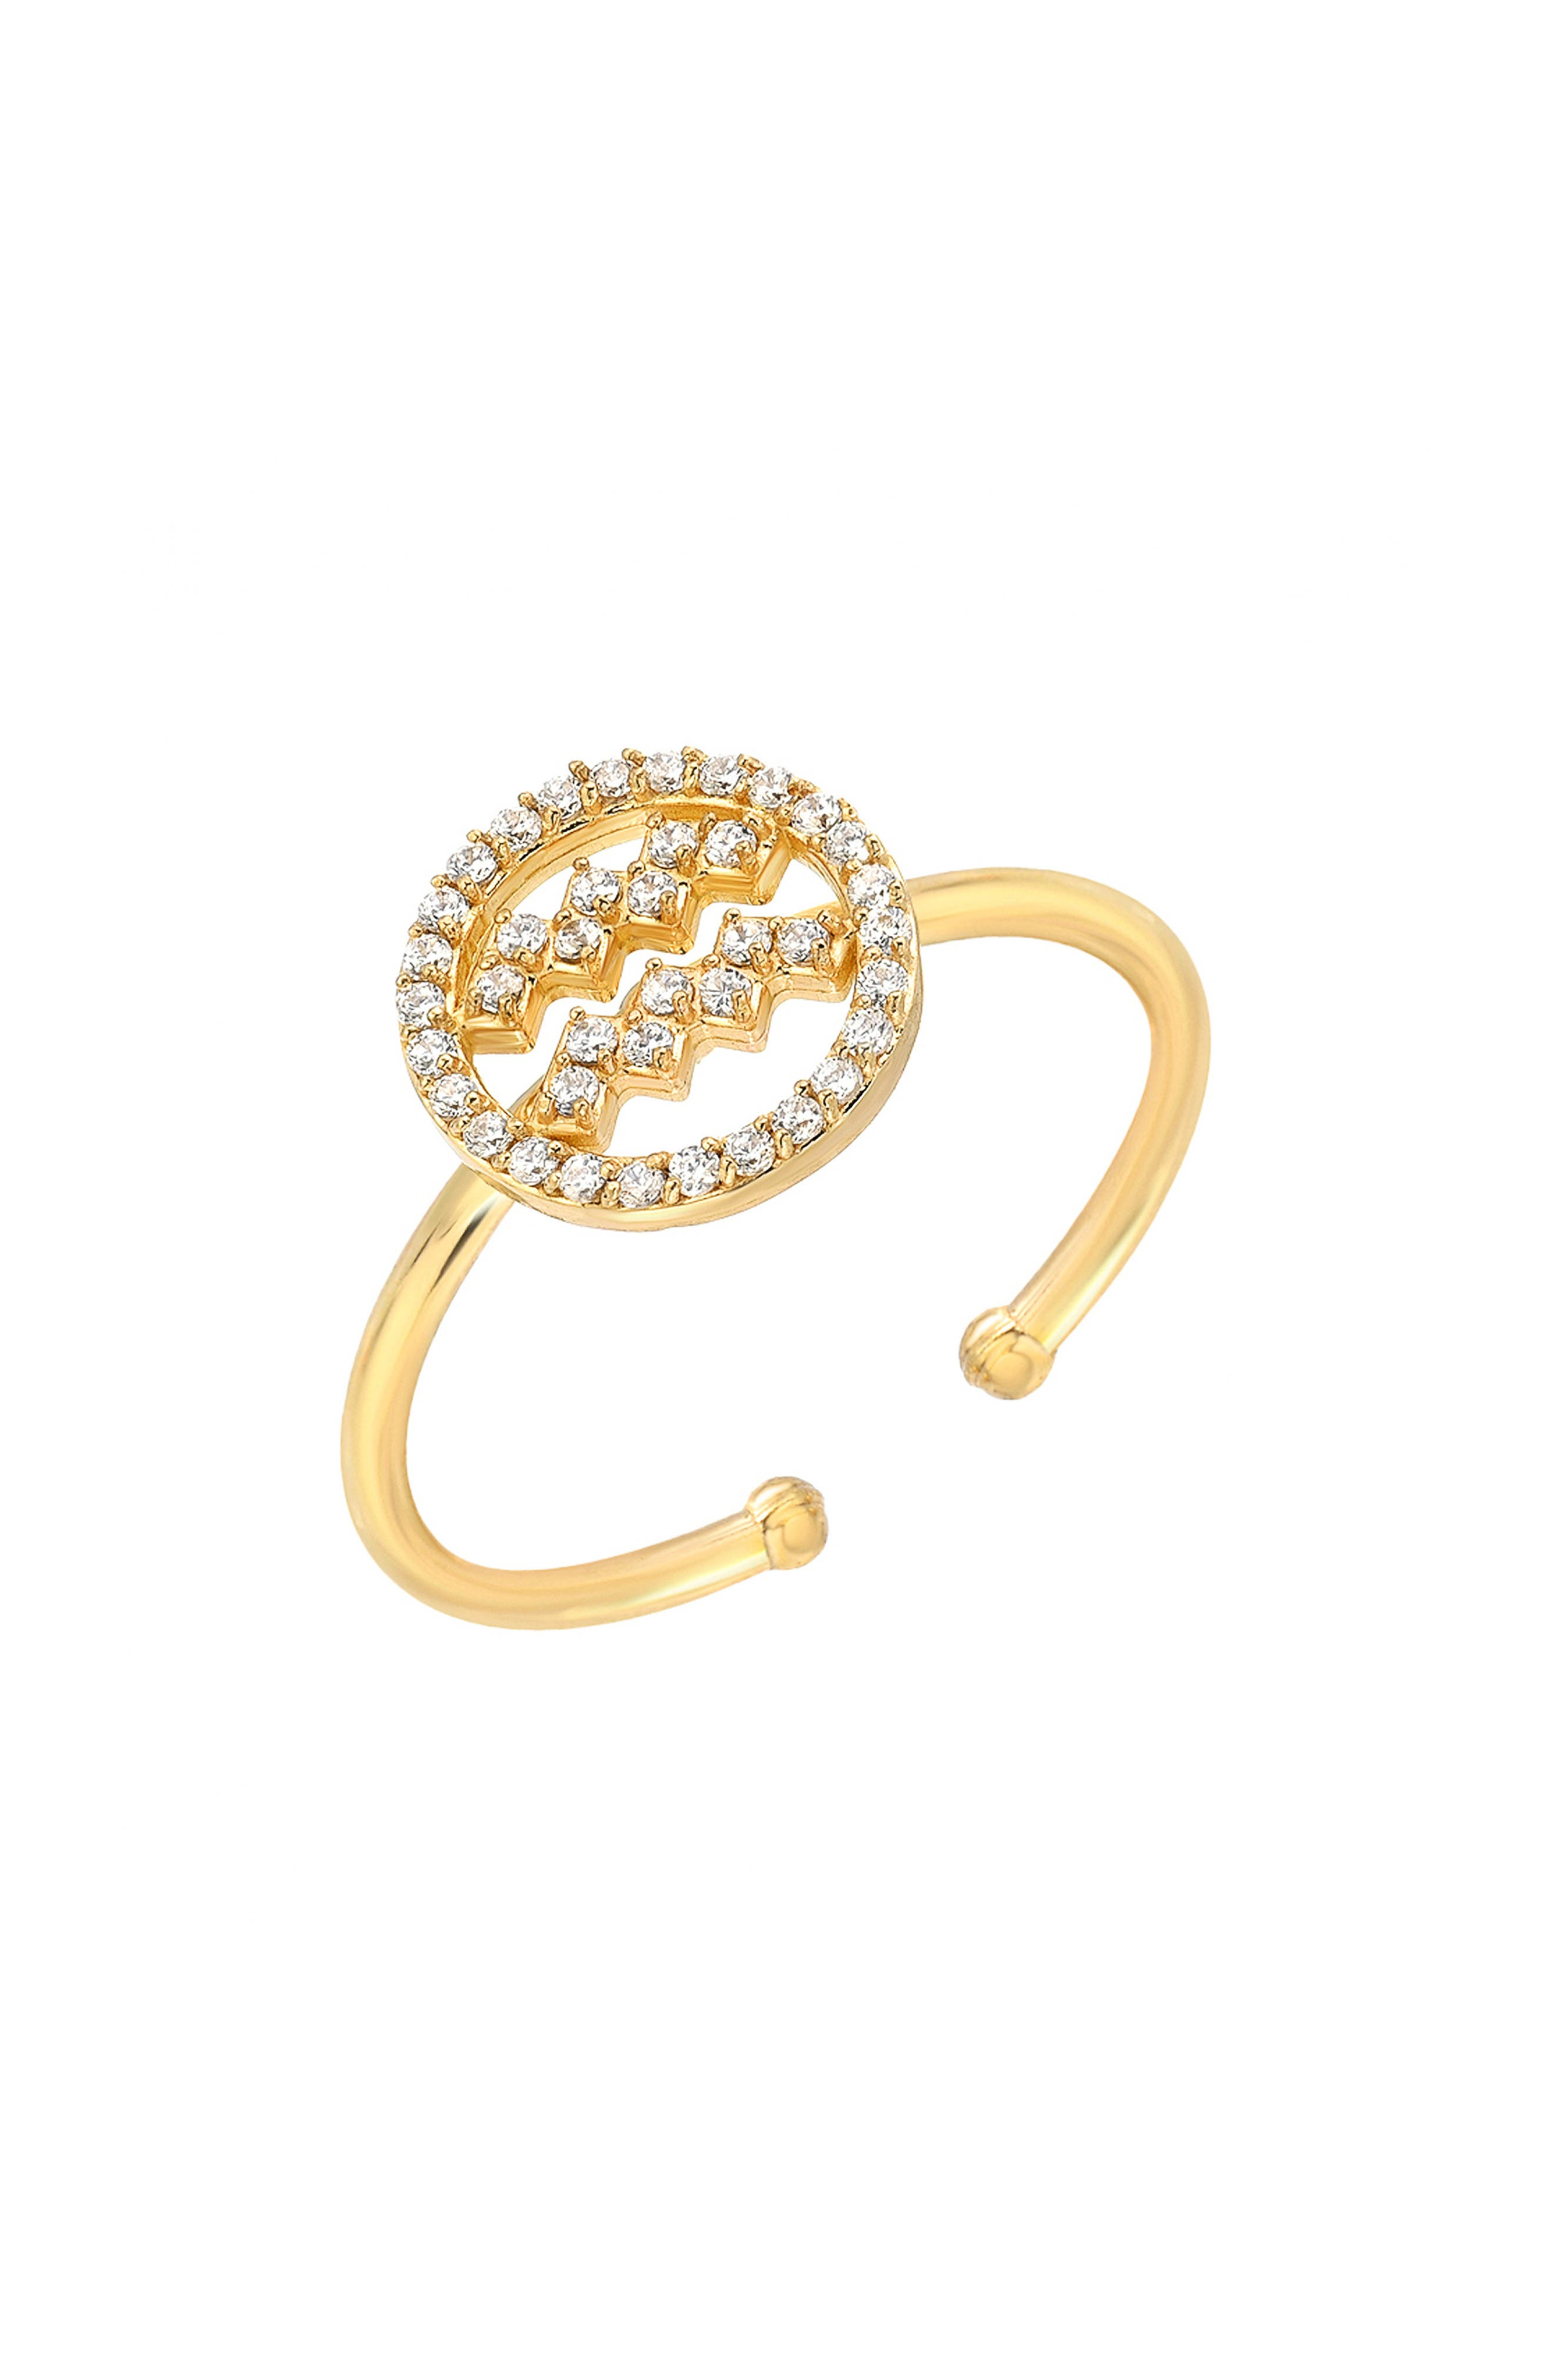 Halo Zodiac Sign Diamond Ring,                             Main thumbnail 1, color,                             YELLOW GOLD-AQUARIUS